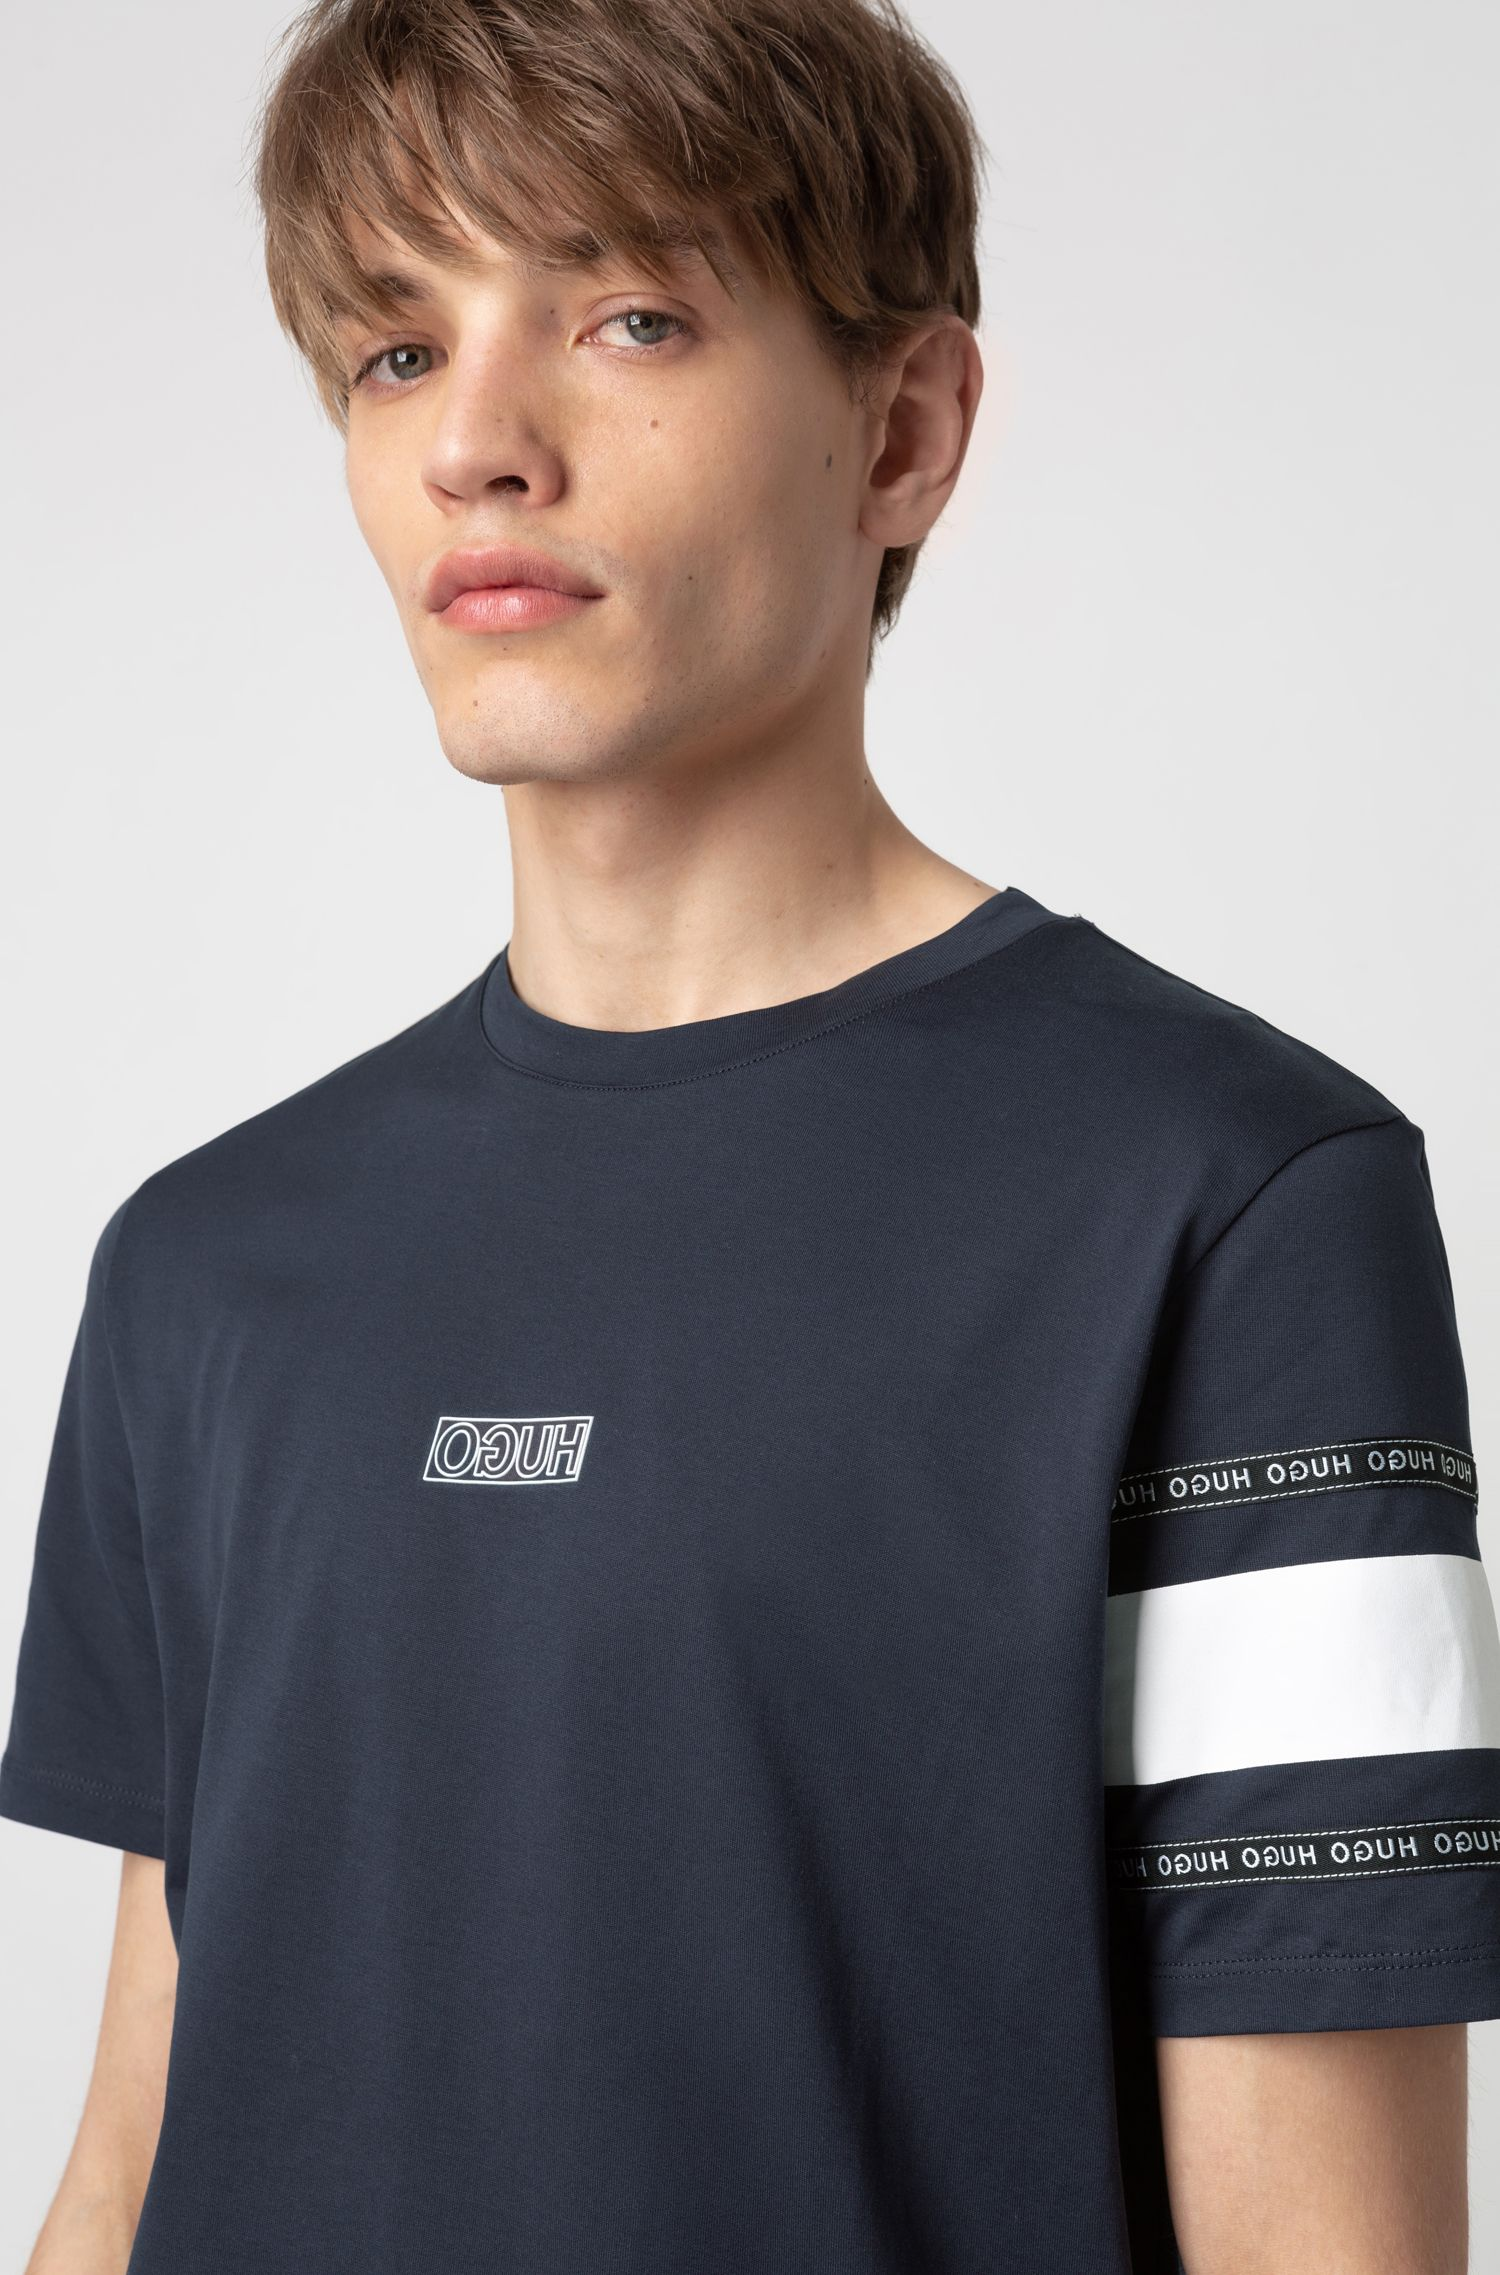 Reverse-logo T-shirt in cotton jersey, Dark Blue